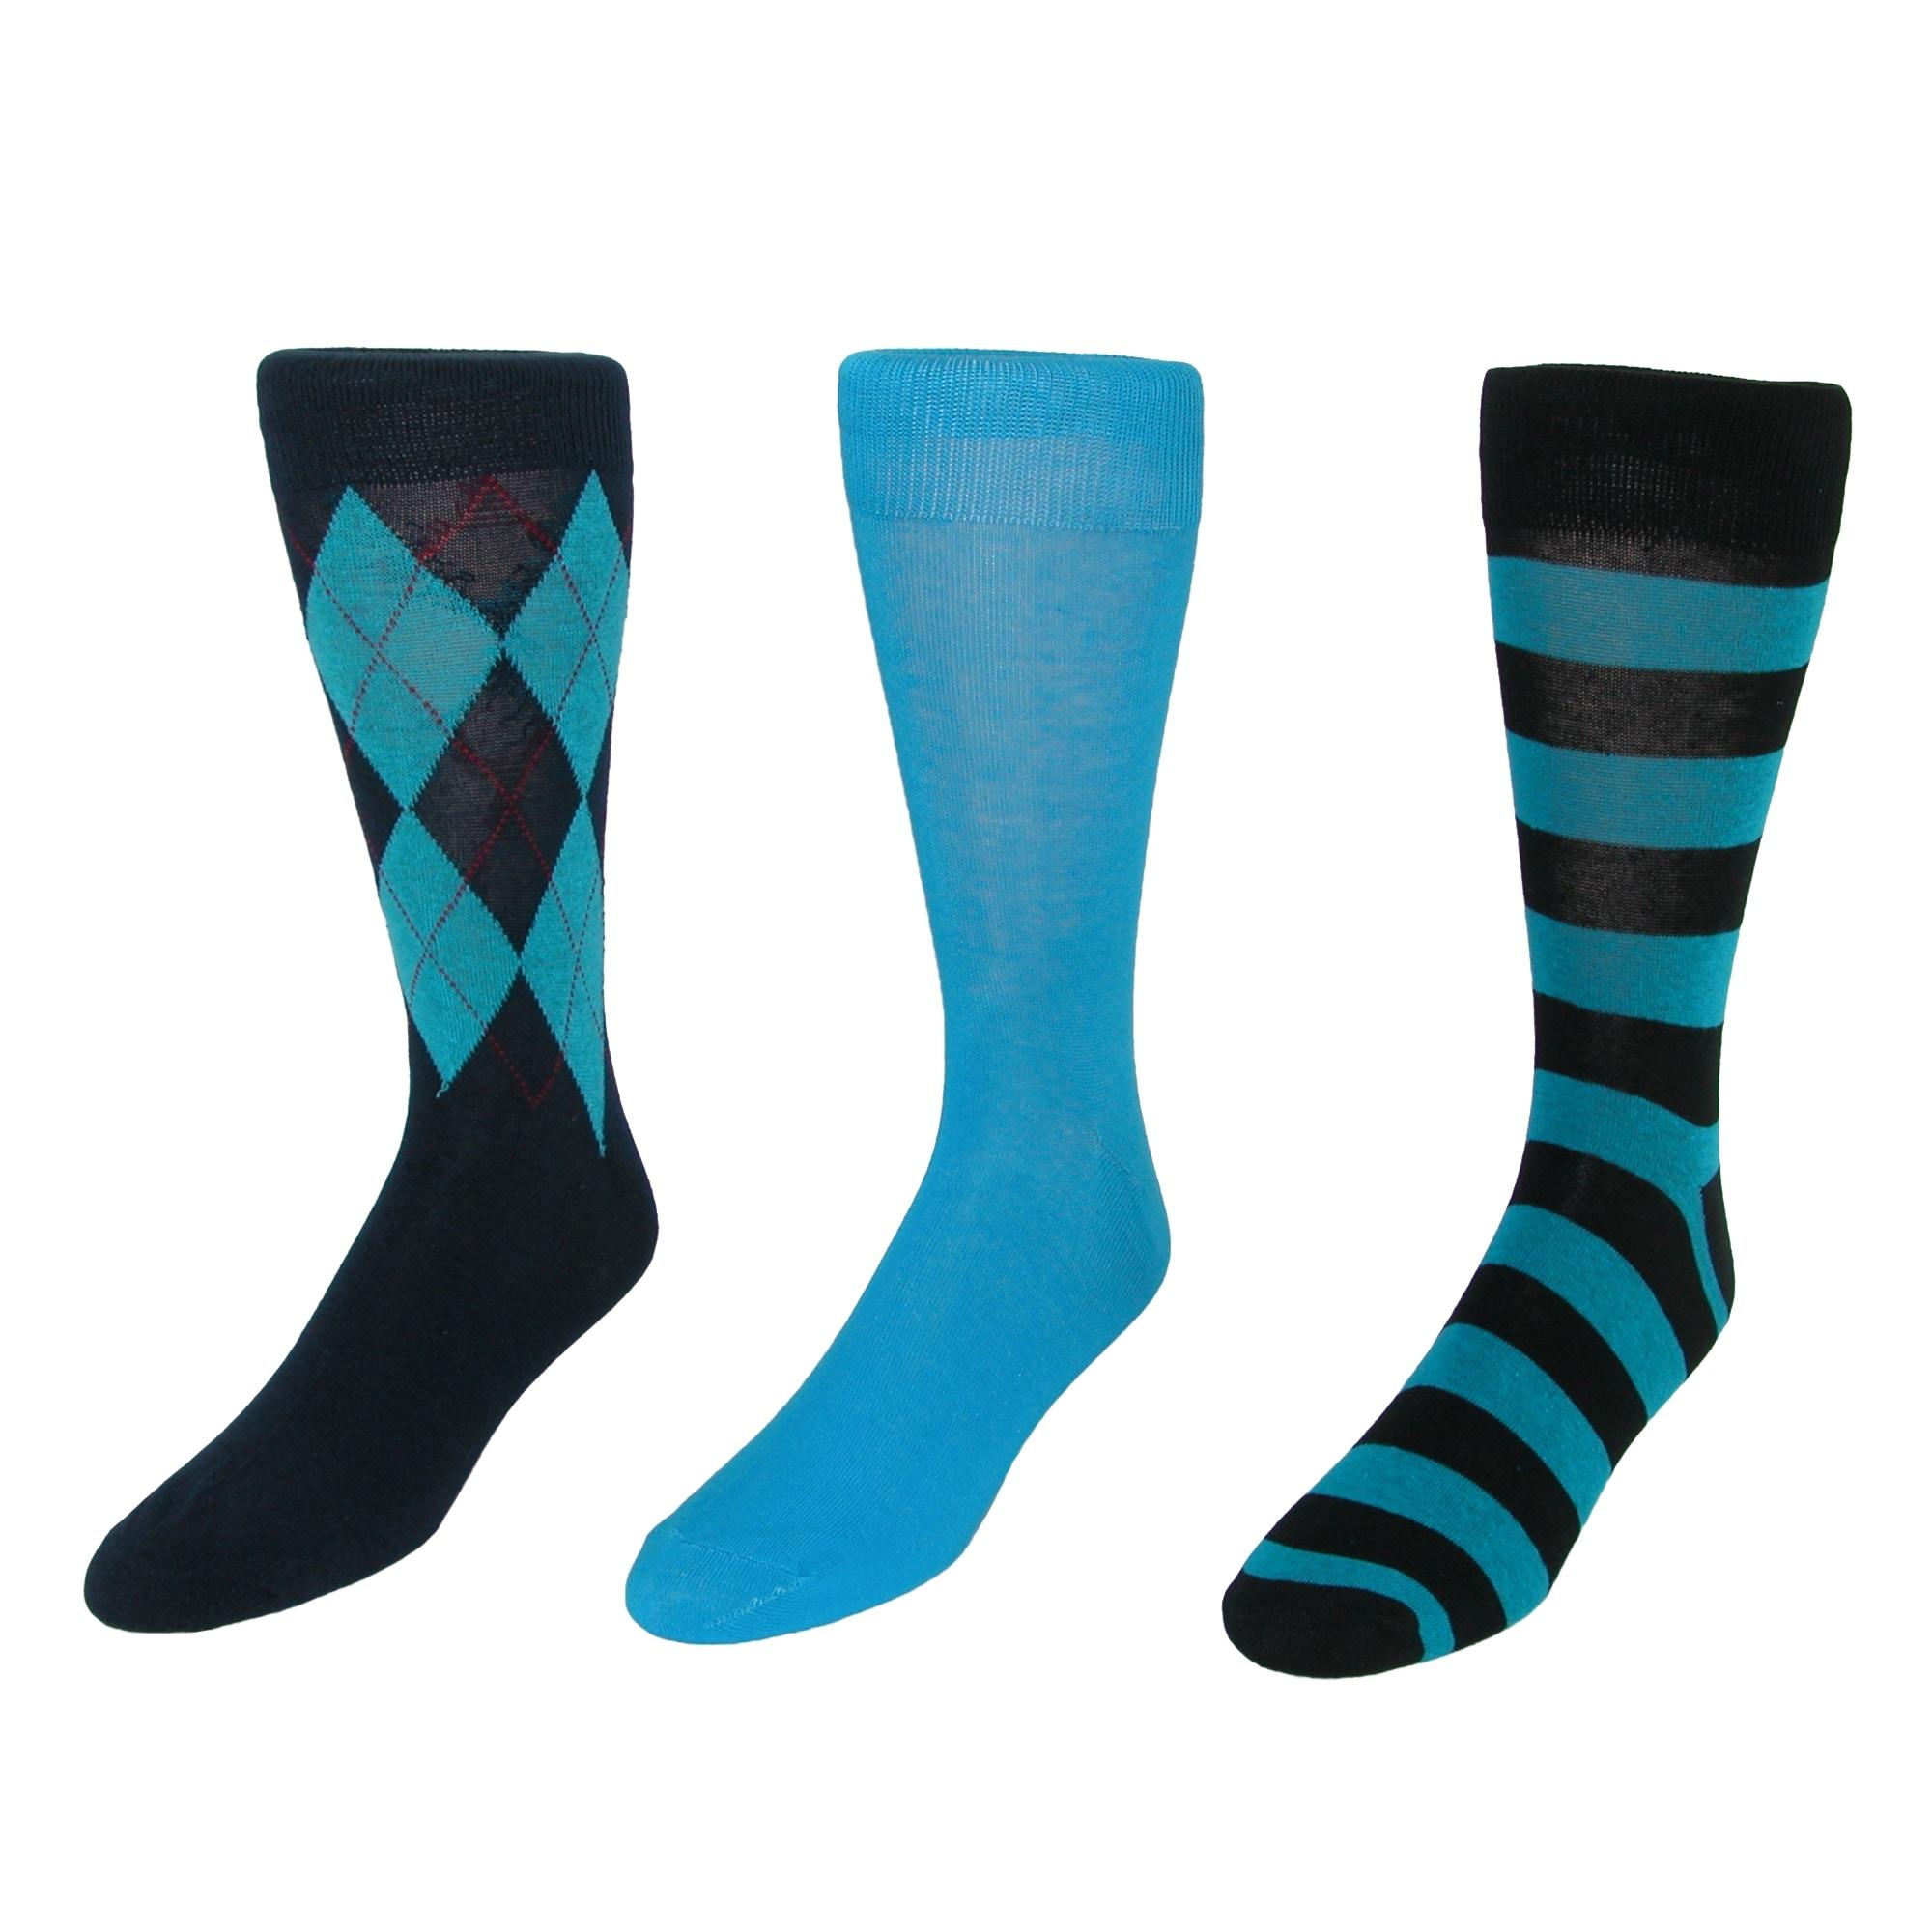 Parquet Men's Dress Sock Gift Box Set (3 Pair Pack)